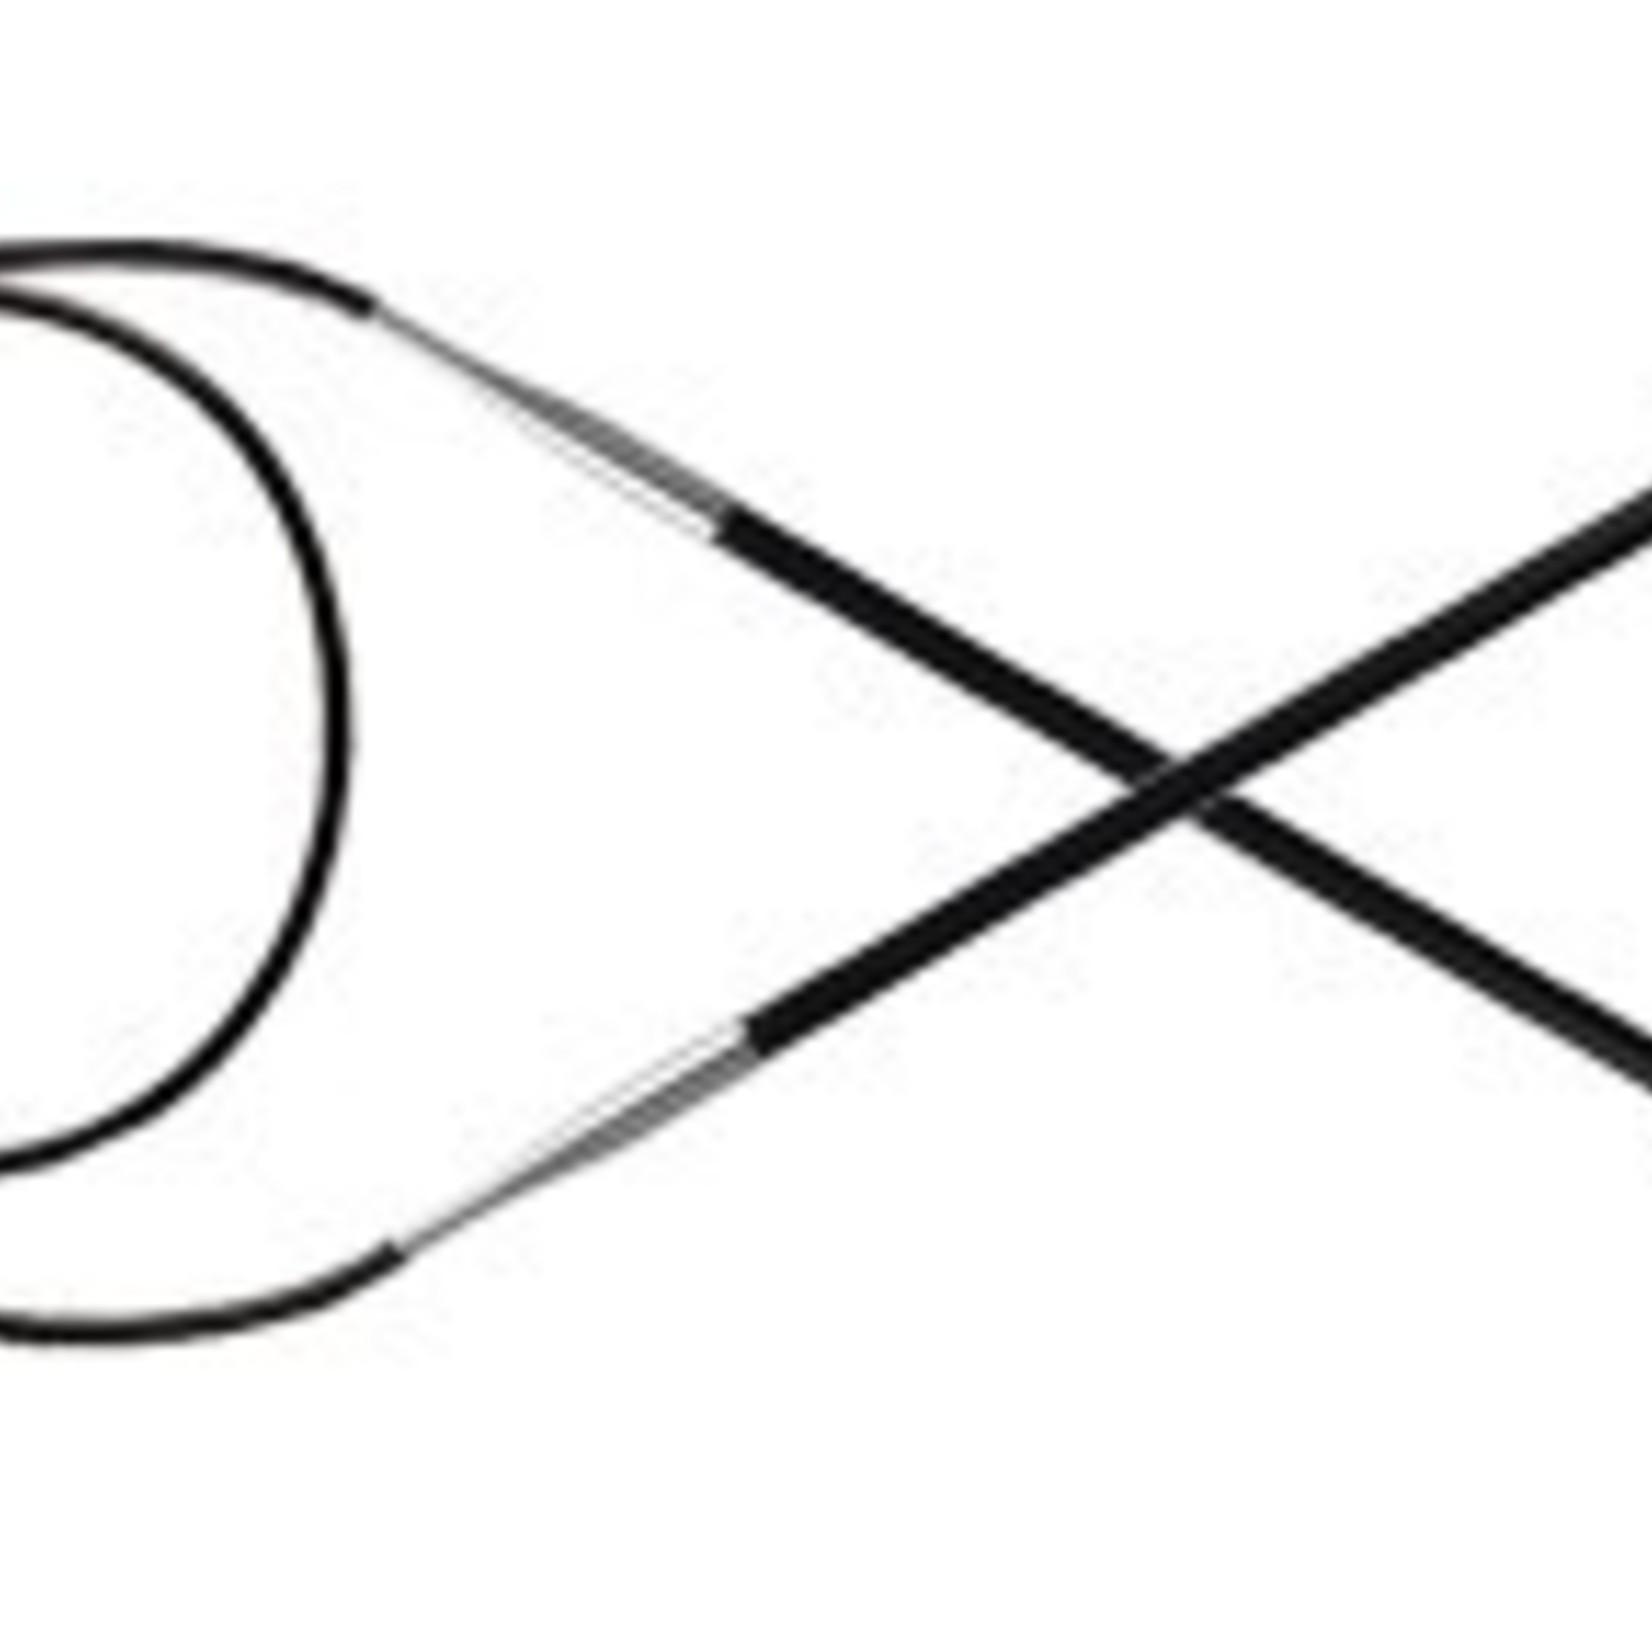 Knitter's Pride 6 Karbonz Circular 32